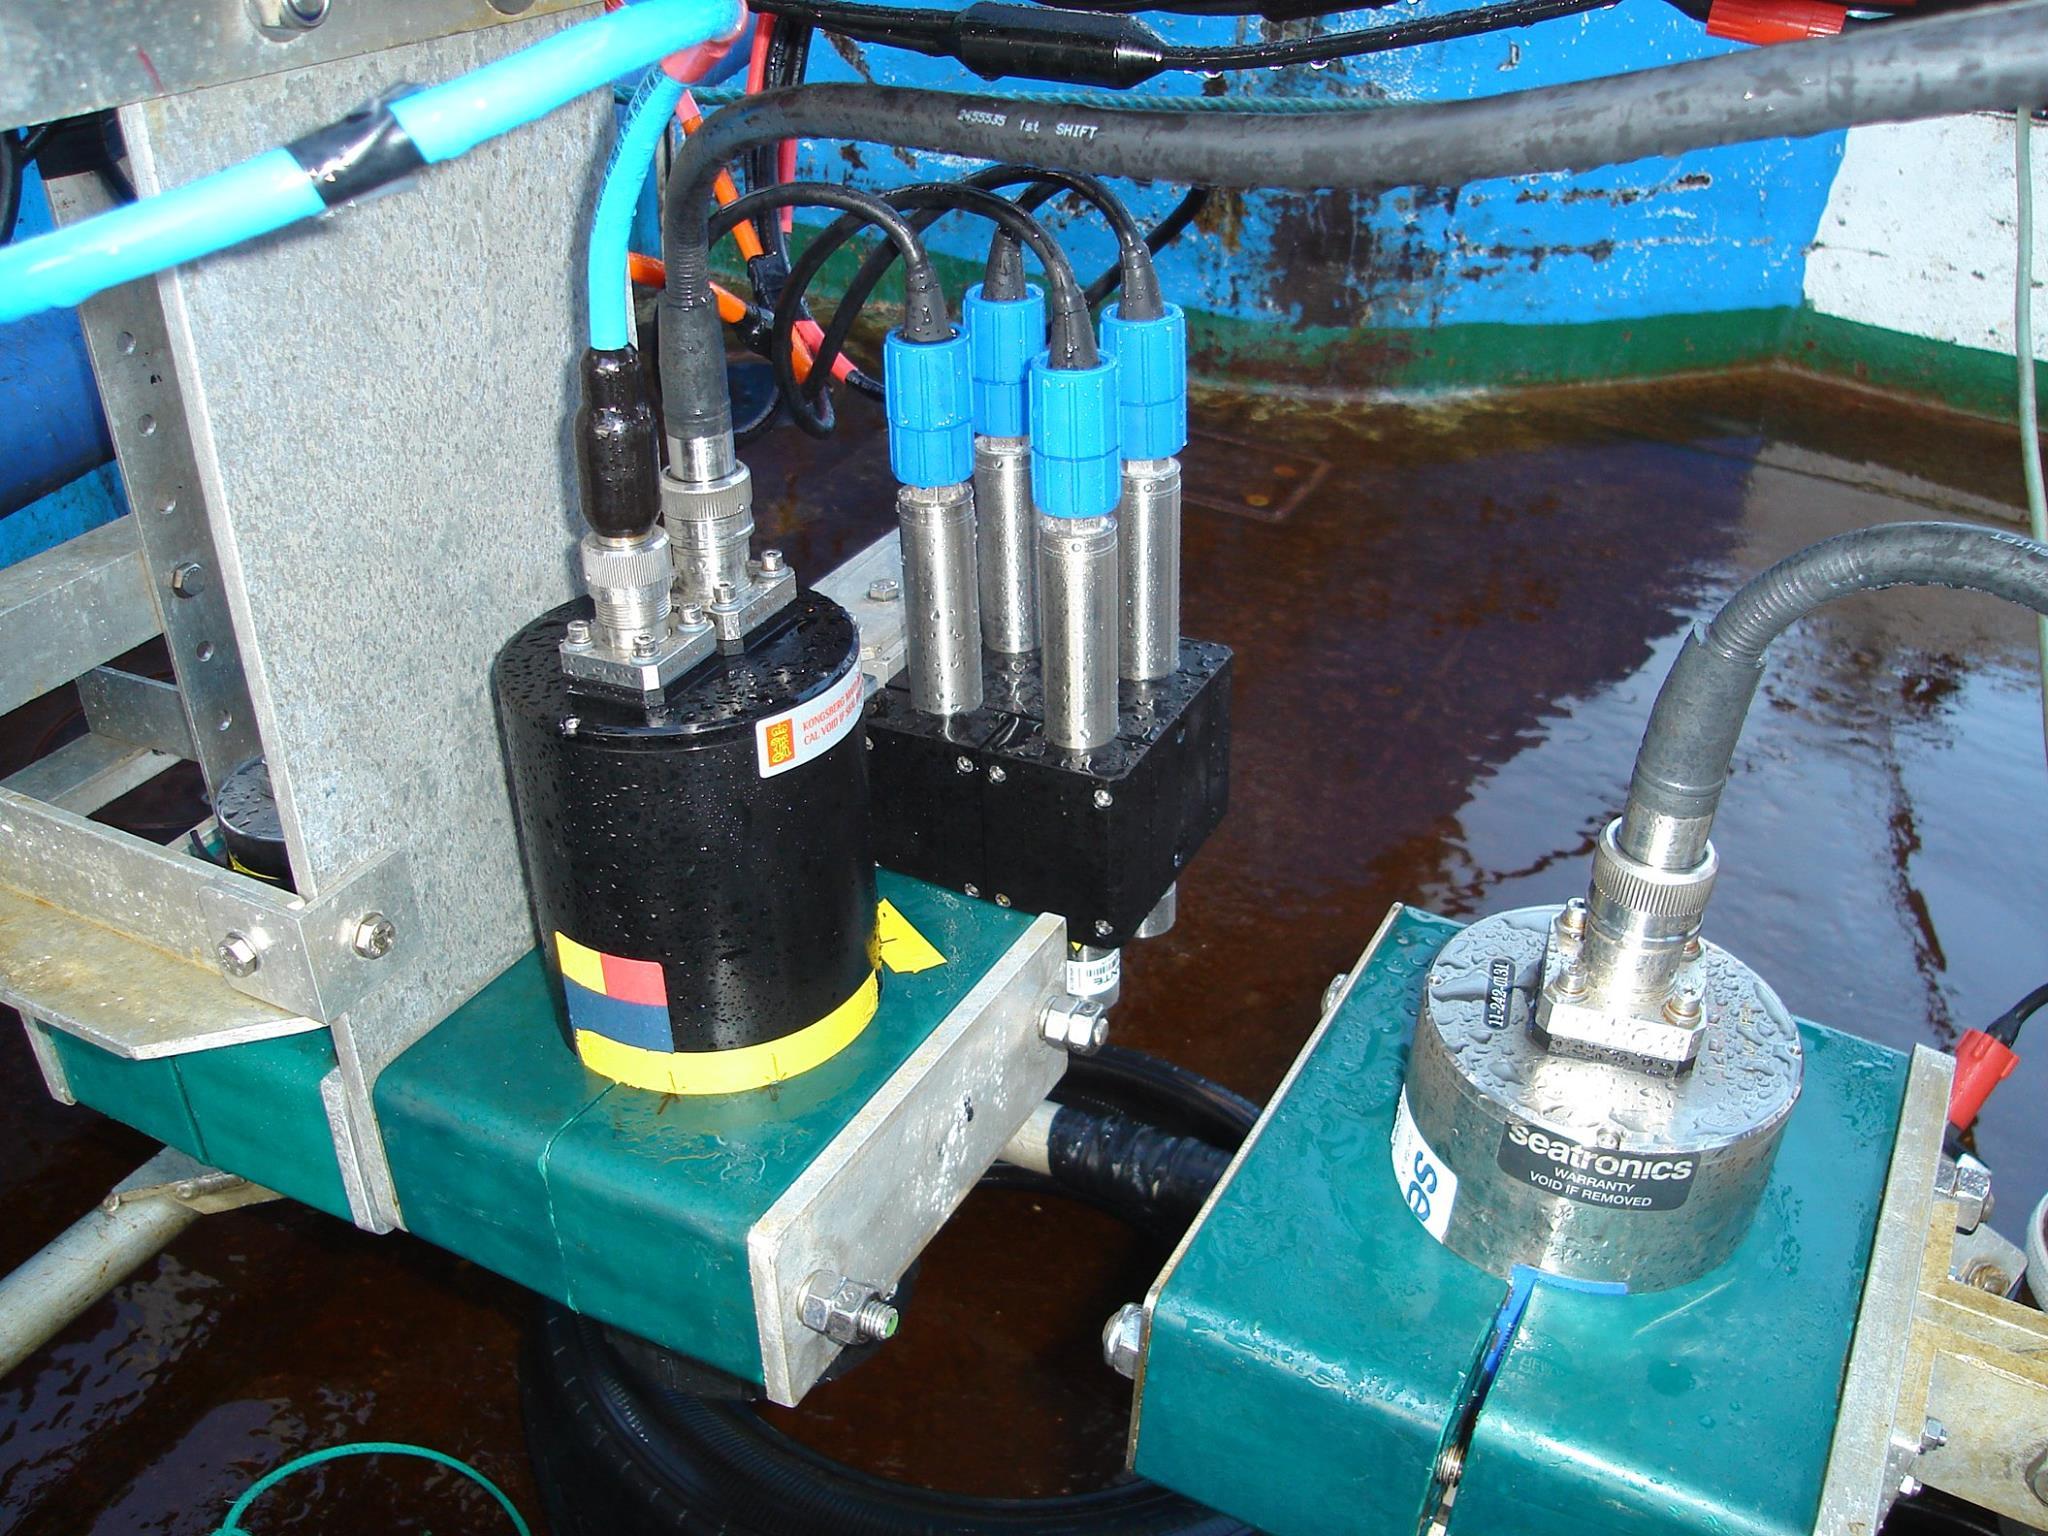 Savante Subsea Lumeneye Laser mounted aboard a benthic habitat mapping drop camera ROV